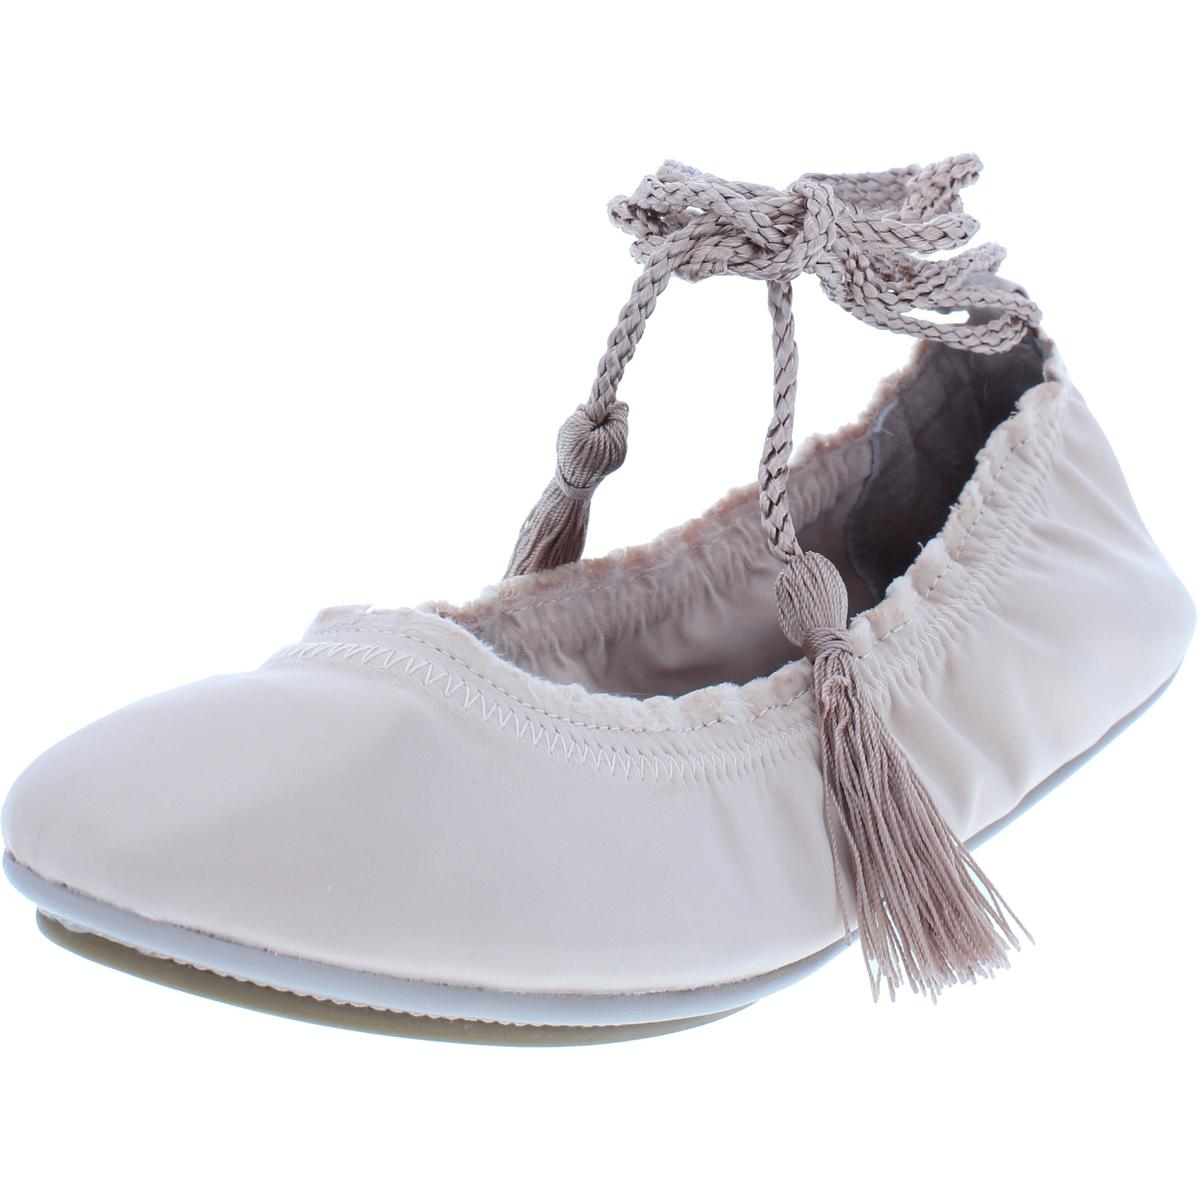 fbebebfde Details about Joie Womens Bandele Satin Ankle Wrap Flats Ballet Flats Shoes  BHFO 9719